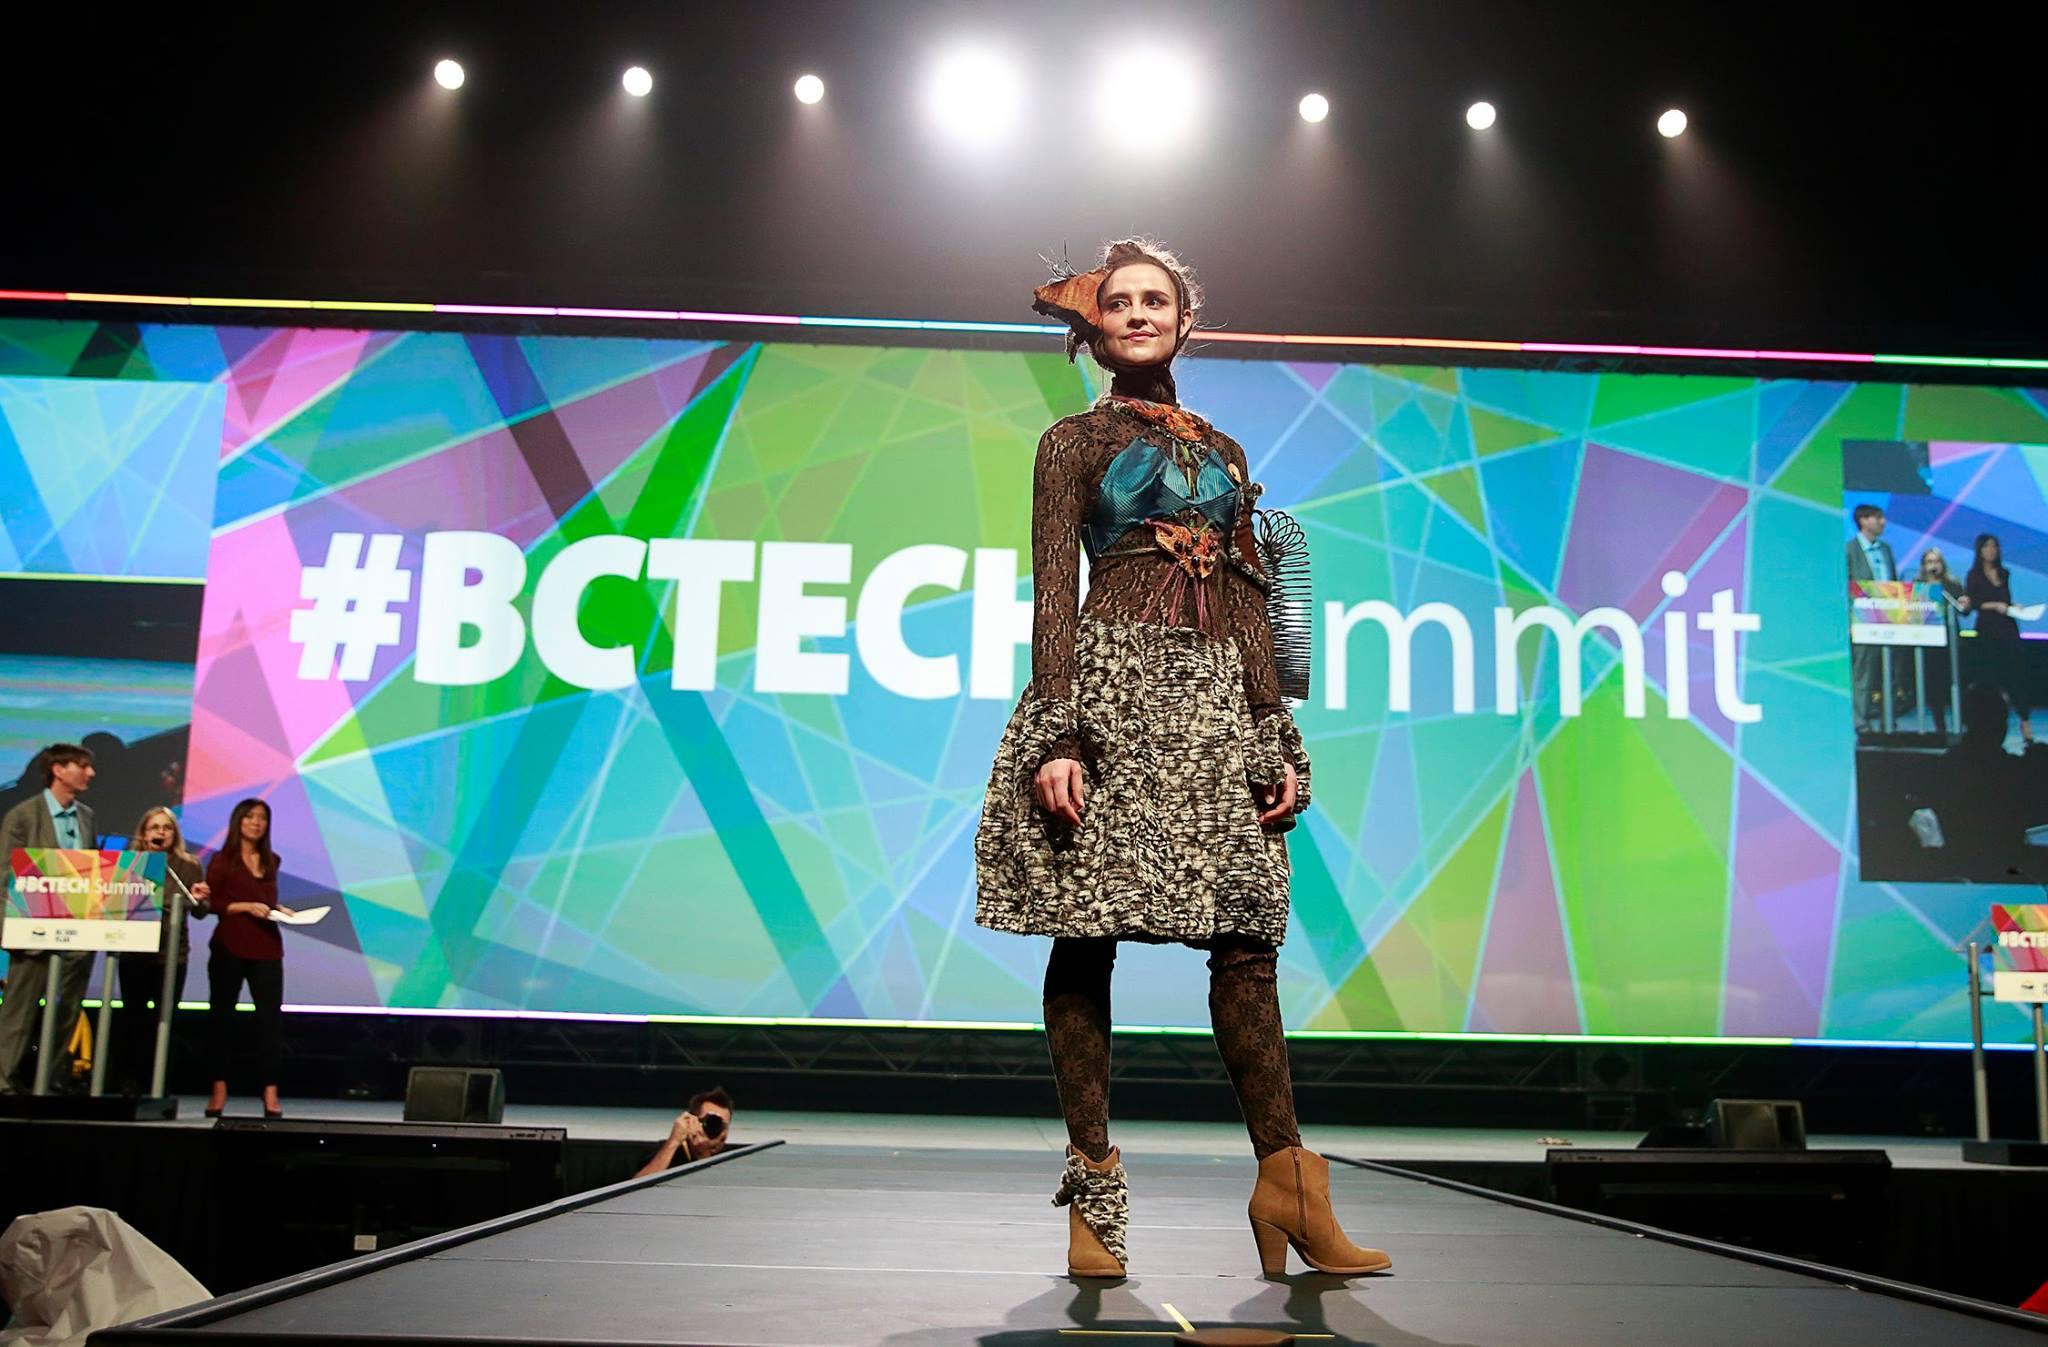 BC Tech Summit 2017